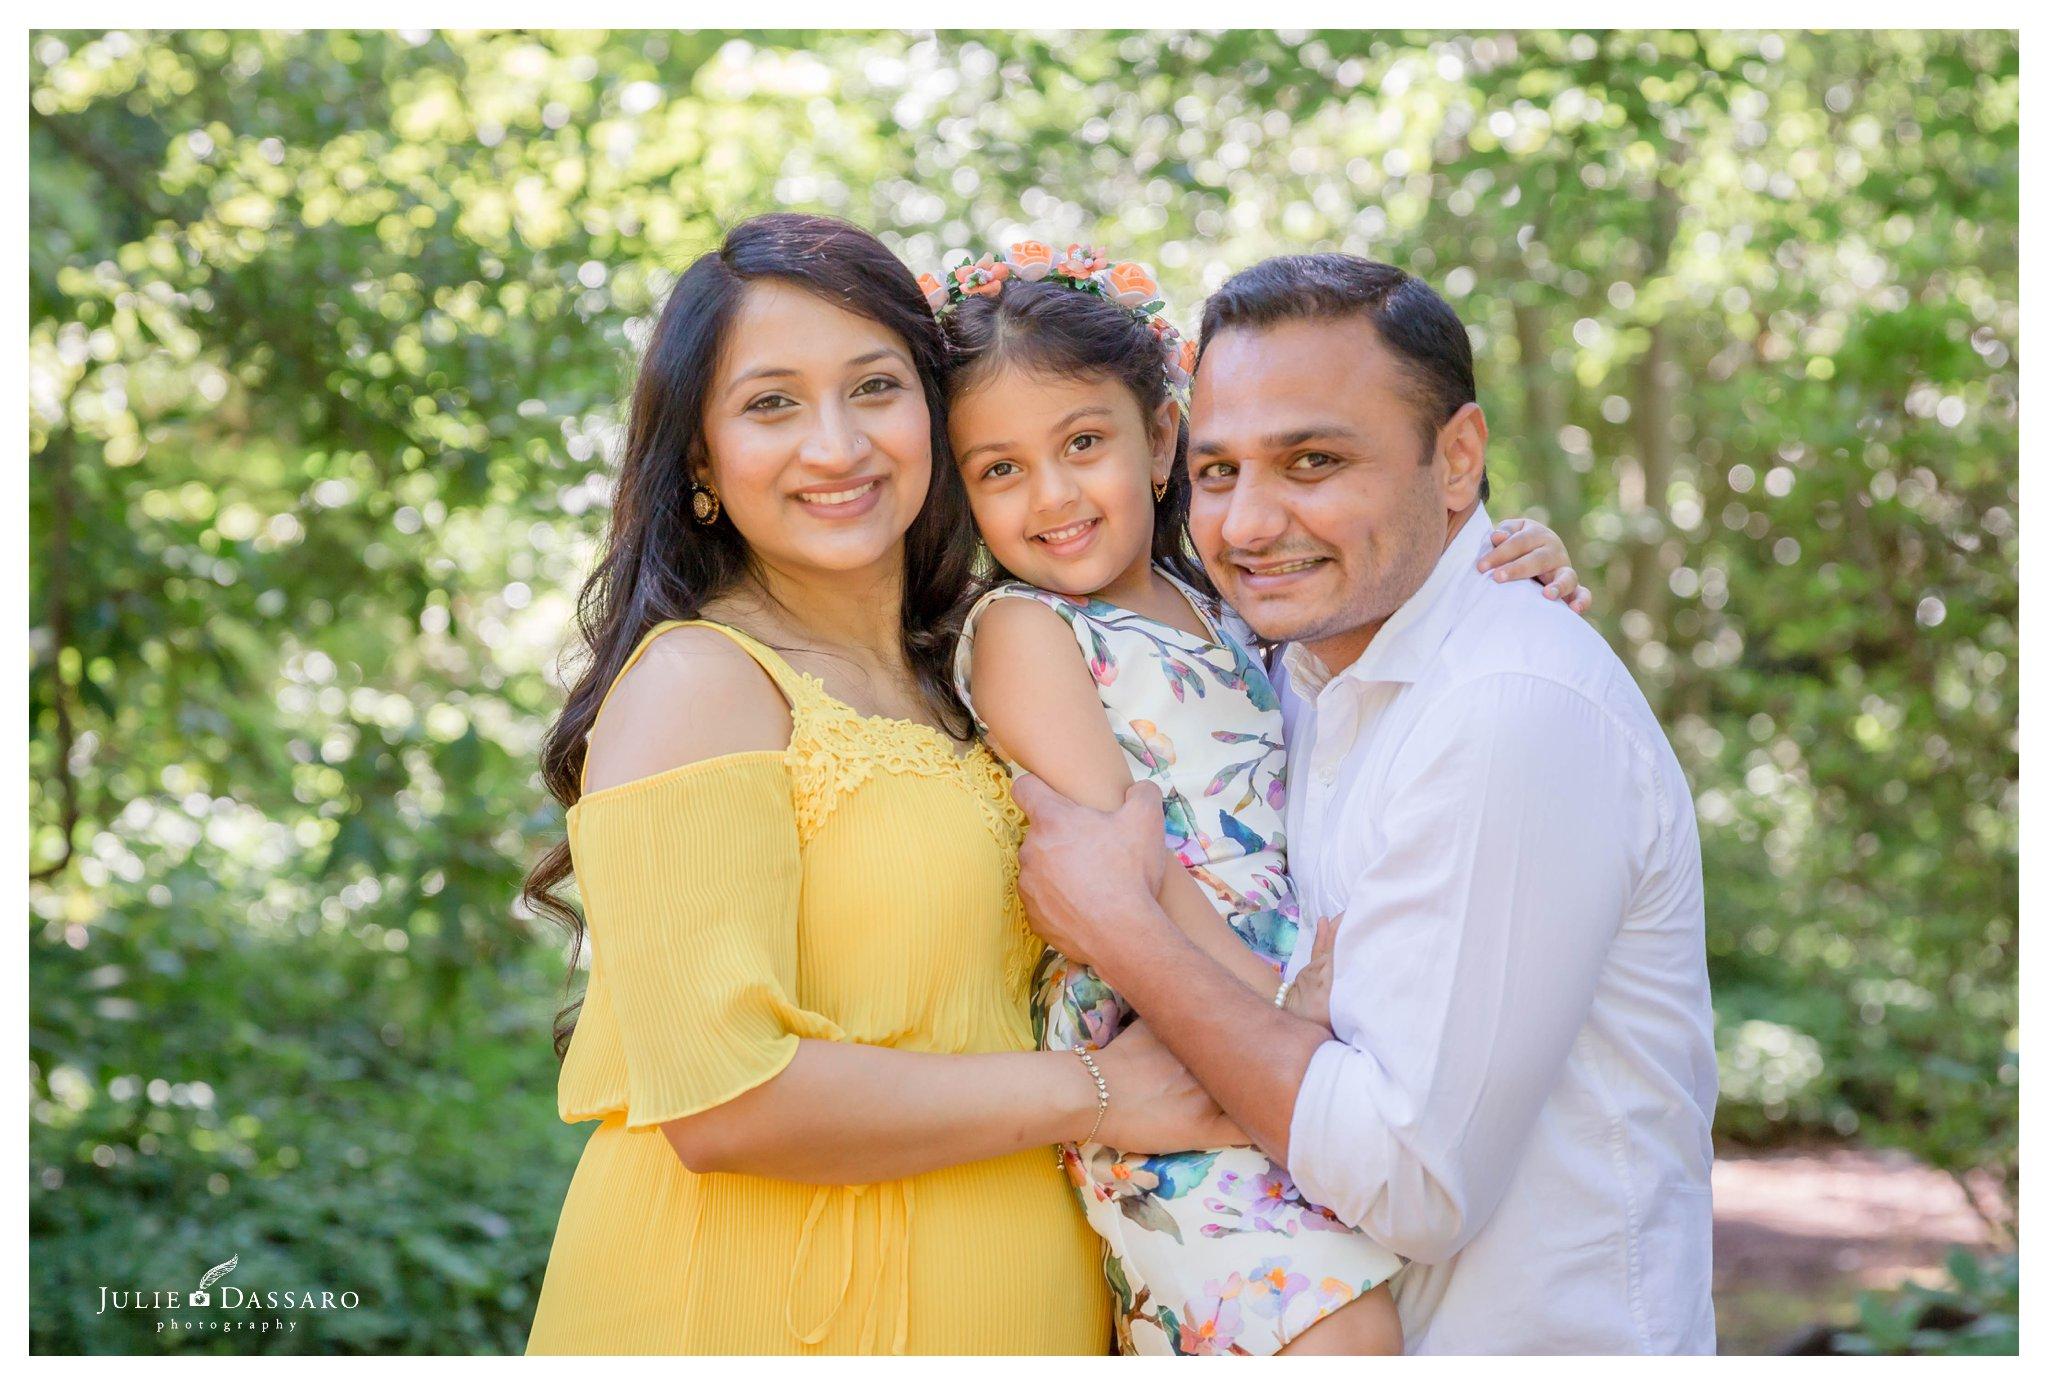 summertime family maternity photos central NJ